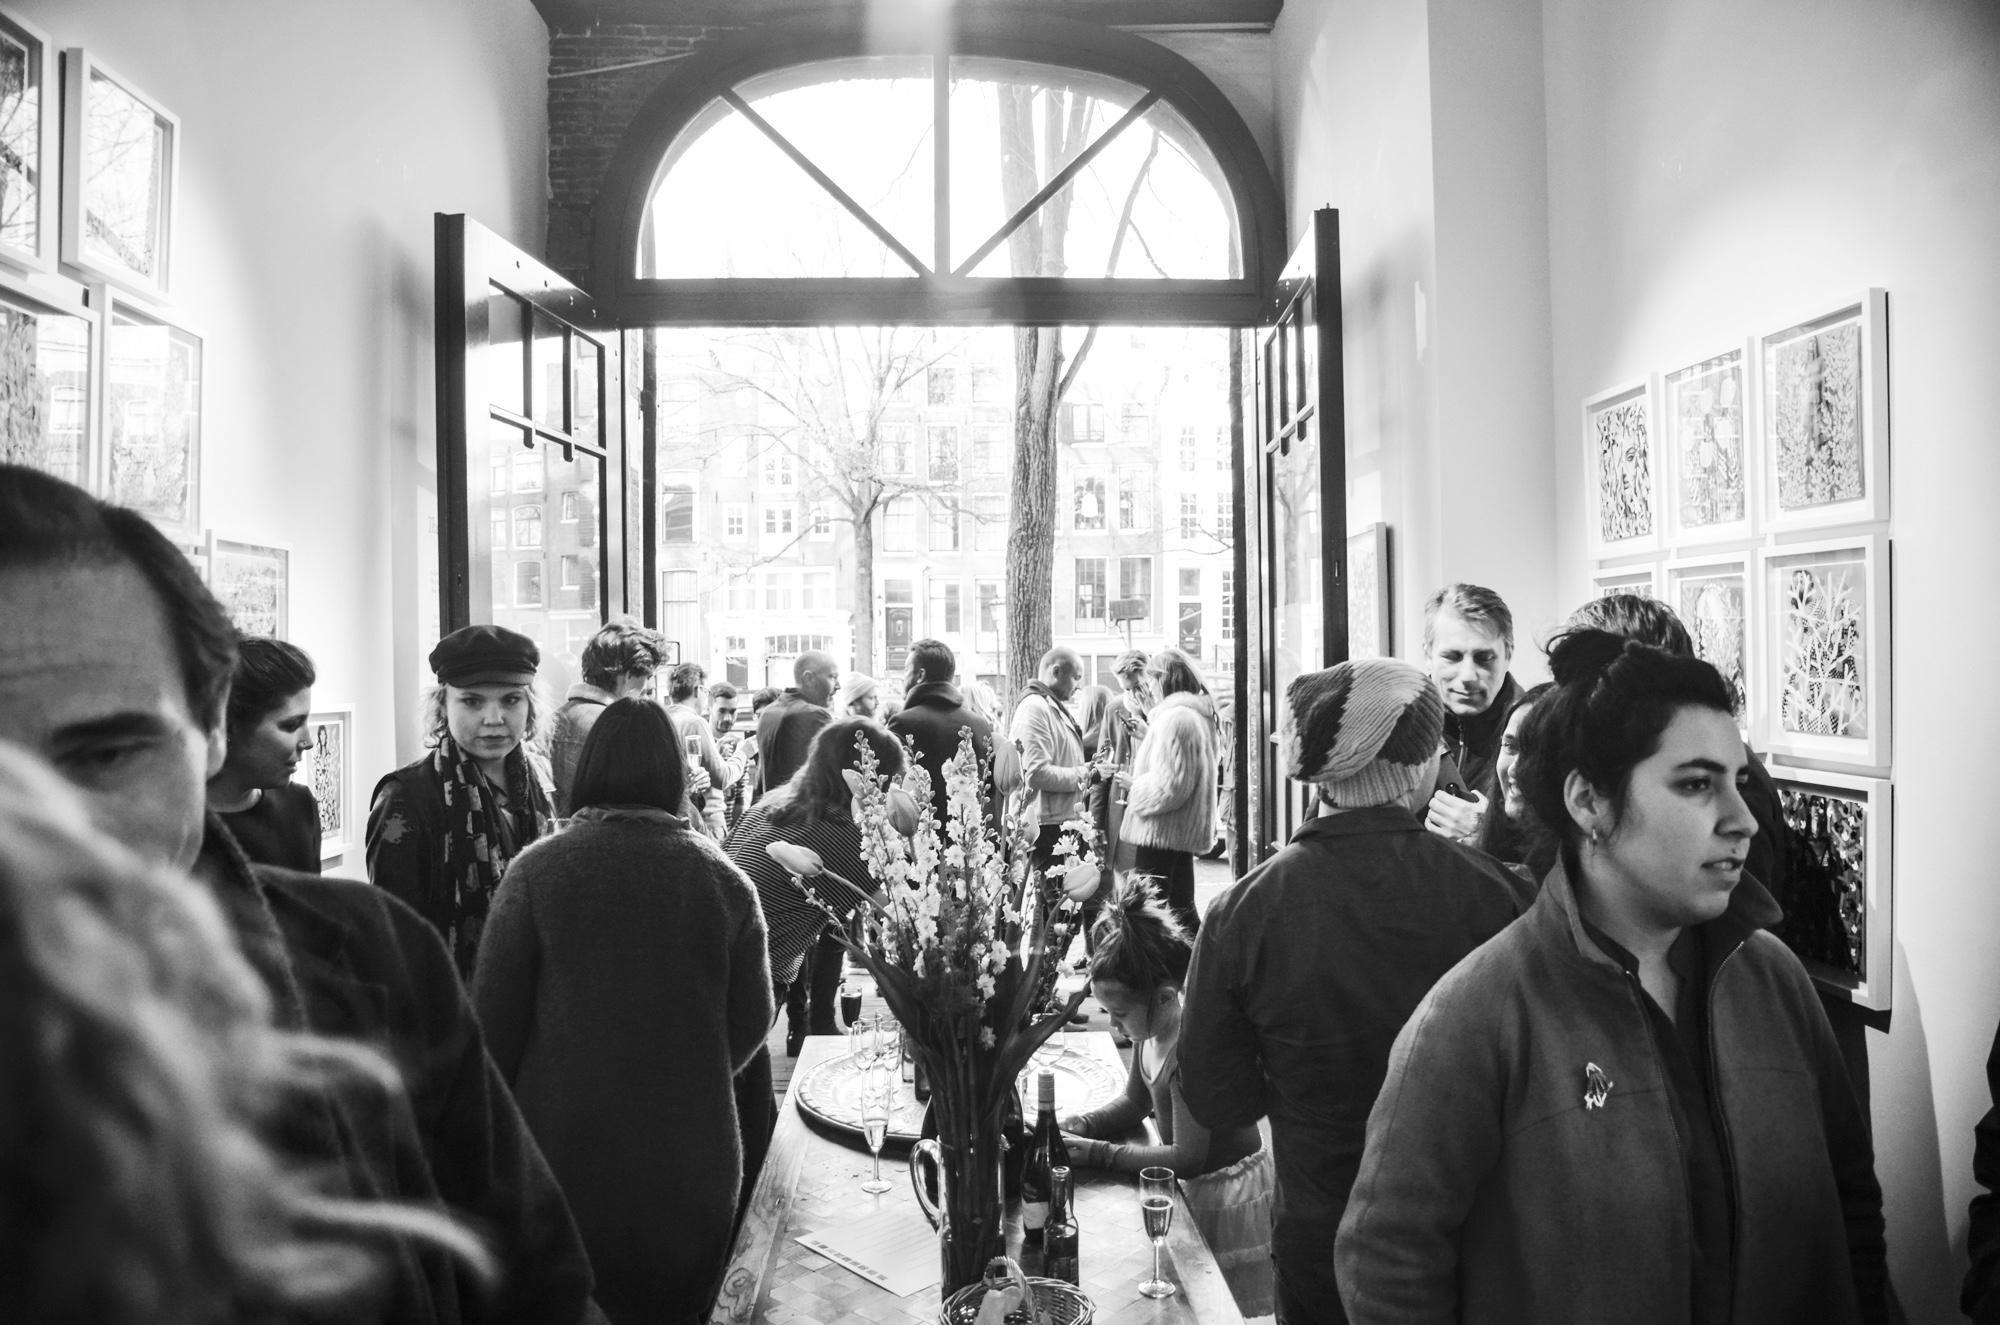 MichaelDeFeo_TheFashionPages_x_TheGarageAmsterdam_Opening10_Photographer_WalterVroegop.jpg